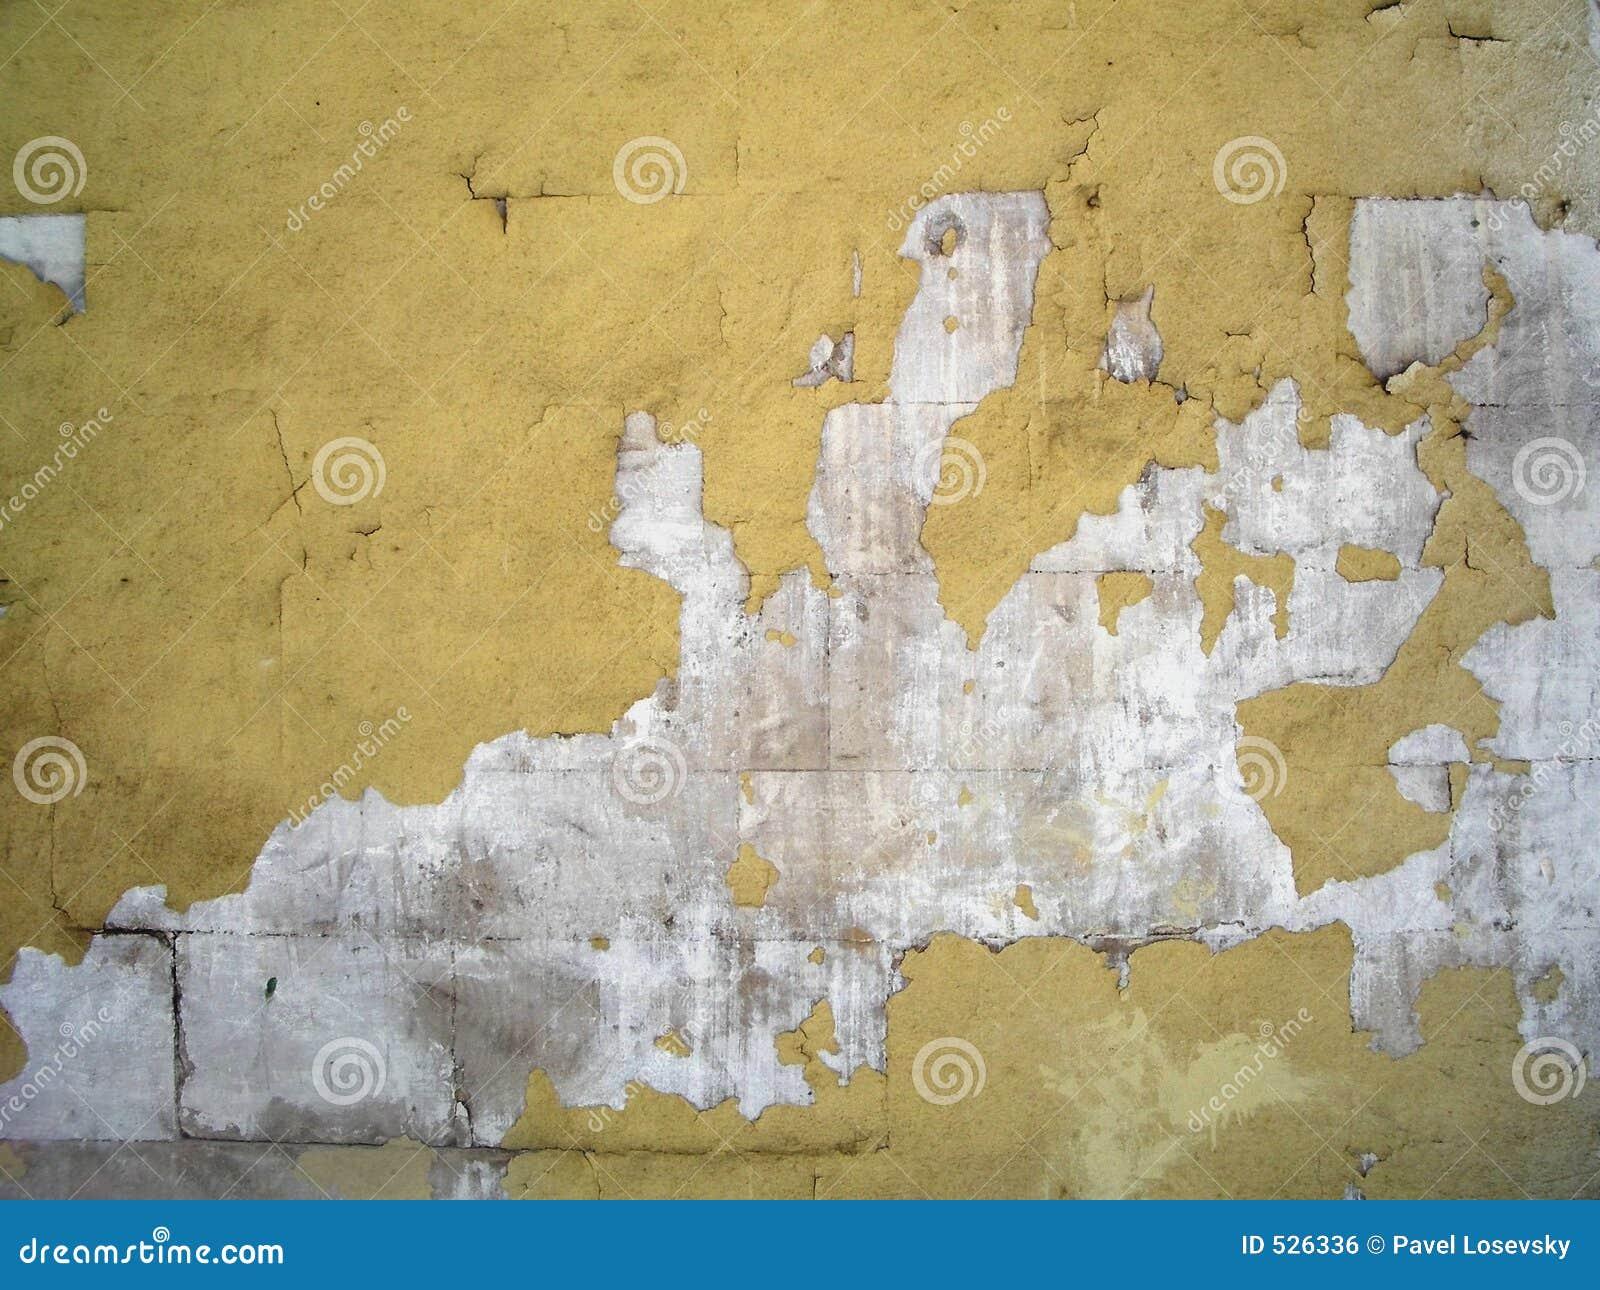 Download 老墙壁 库存照片. 图片 包括有 保险开关, 石工, 干净, 背包, 房子, 解决, 夜间, 秋天, 残骸, 粉煤渣 - 526336